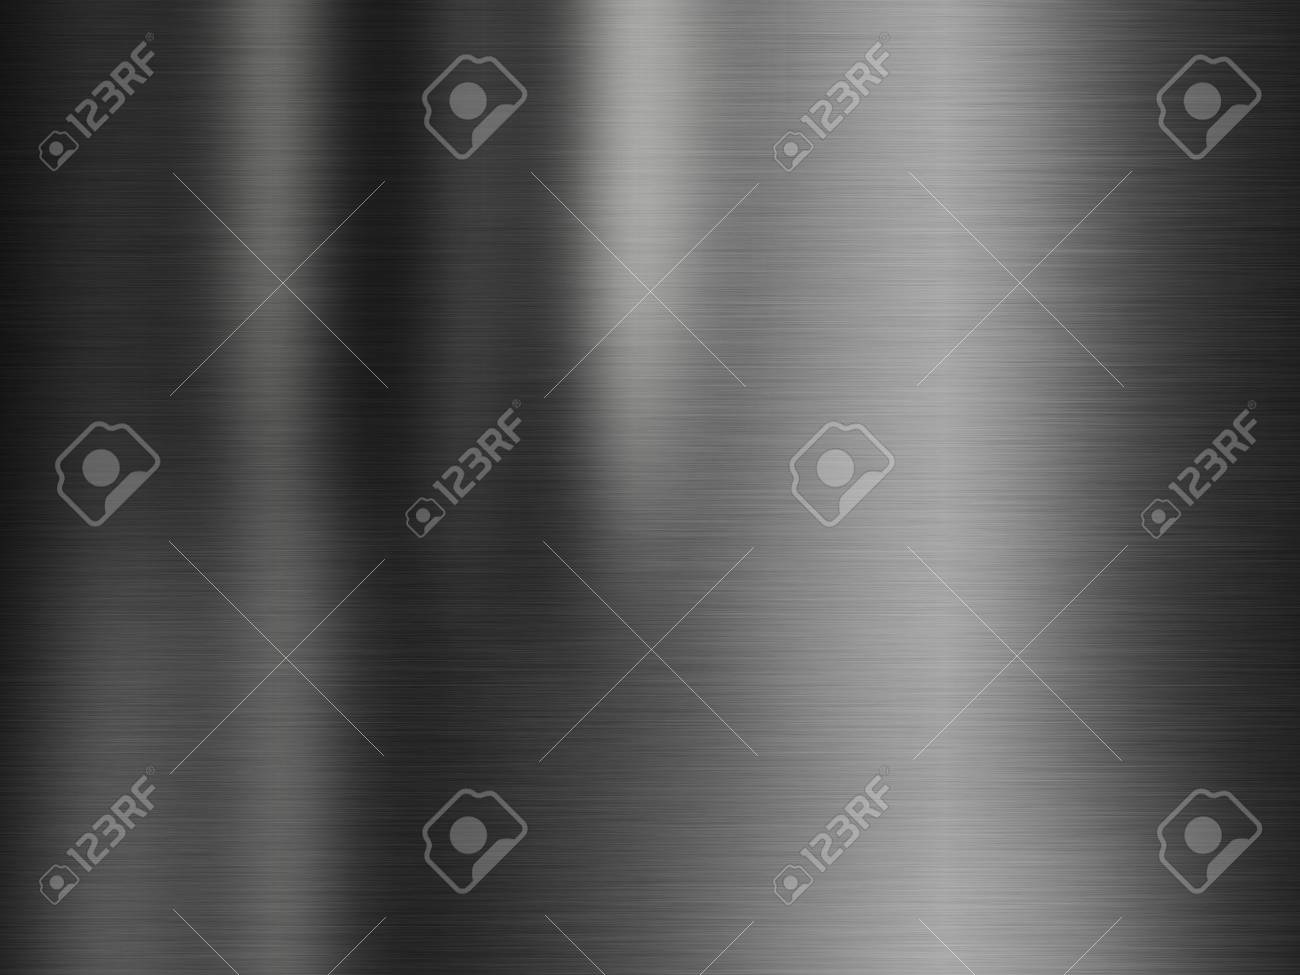 texture en acier inoxydable ou en métal texture de fond Banque d'images - 75076756